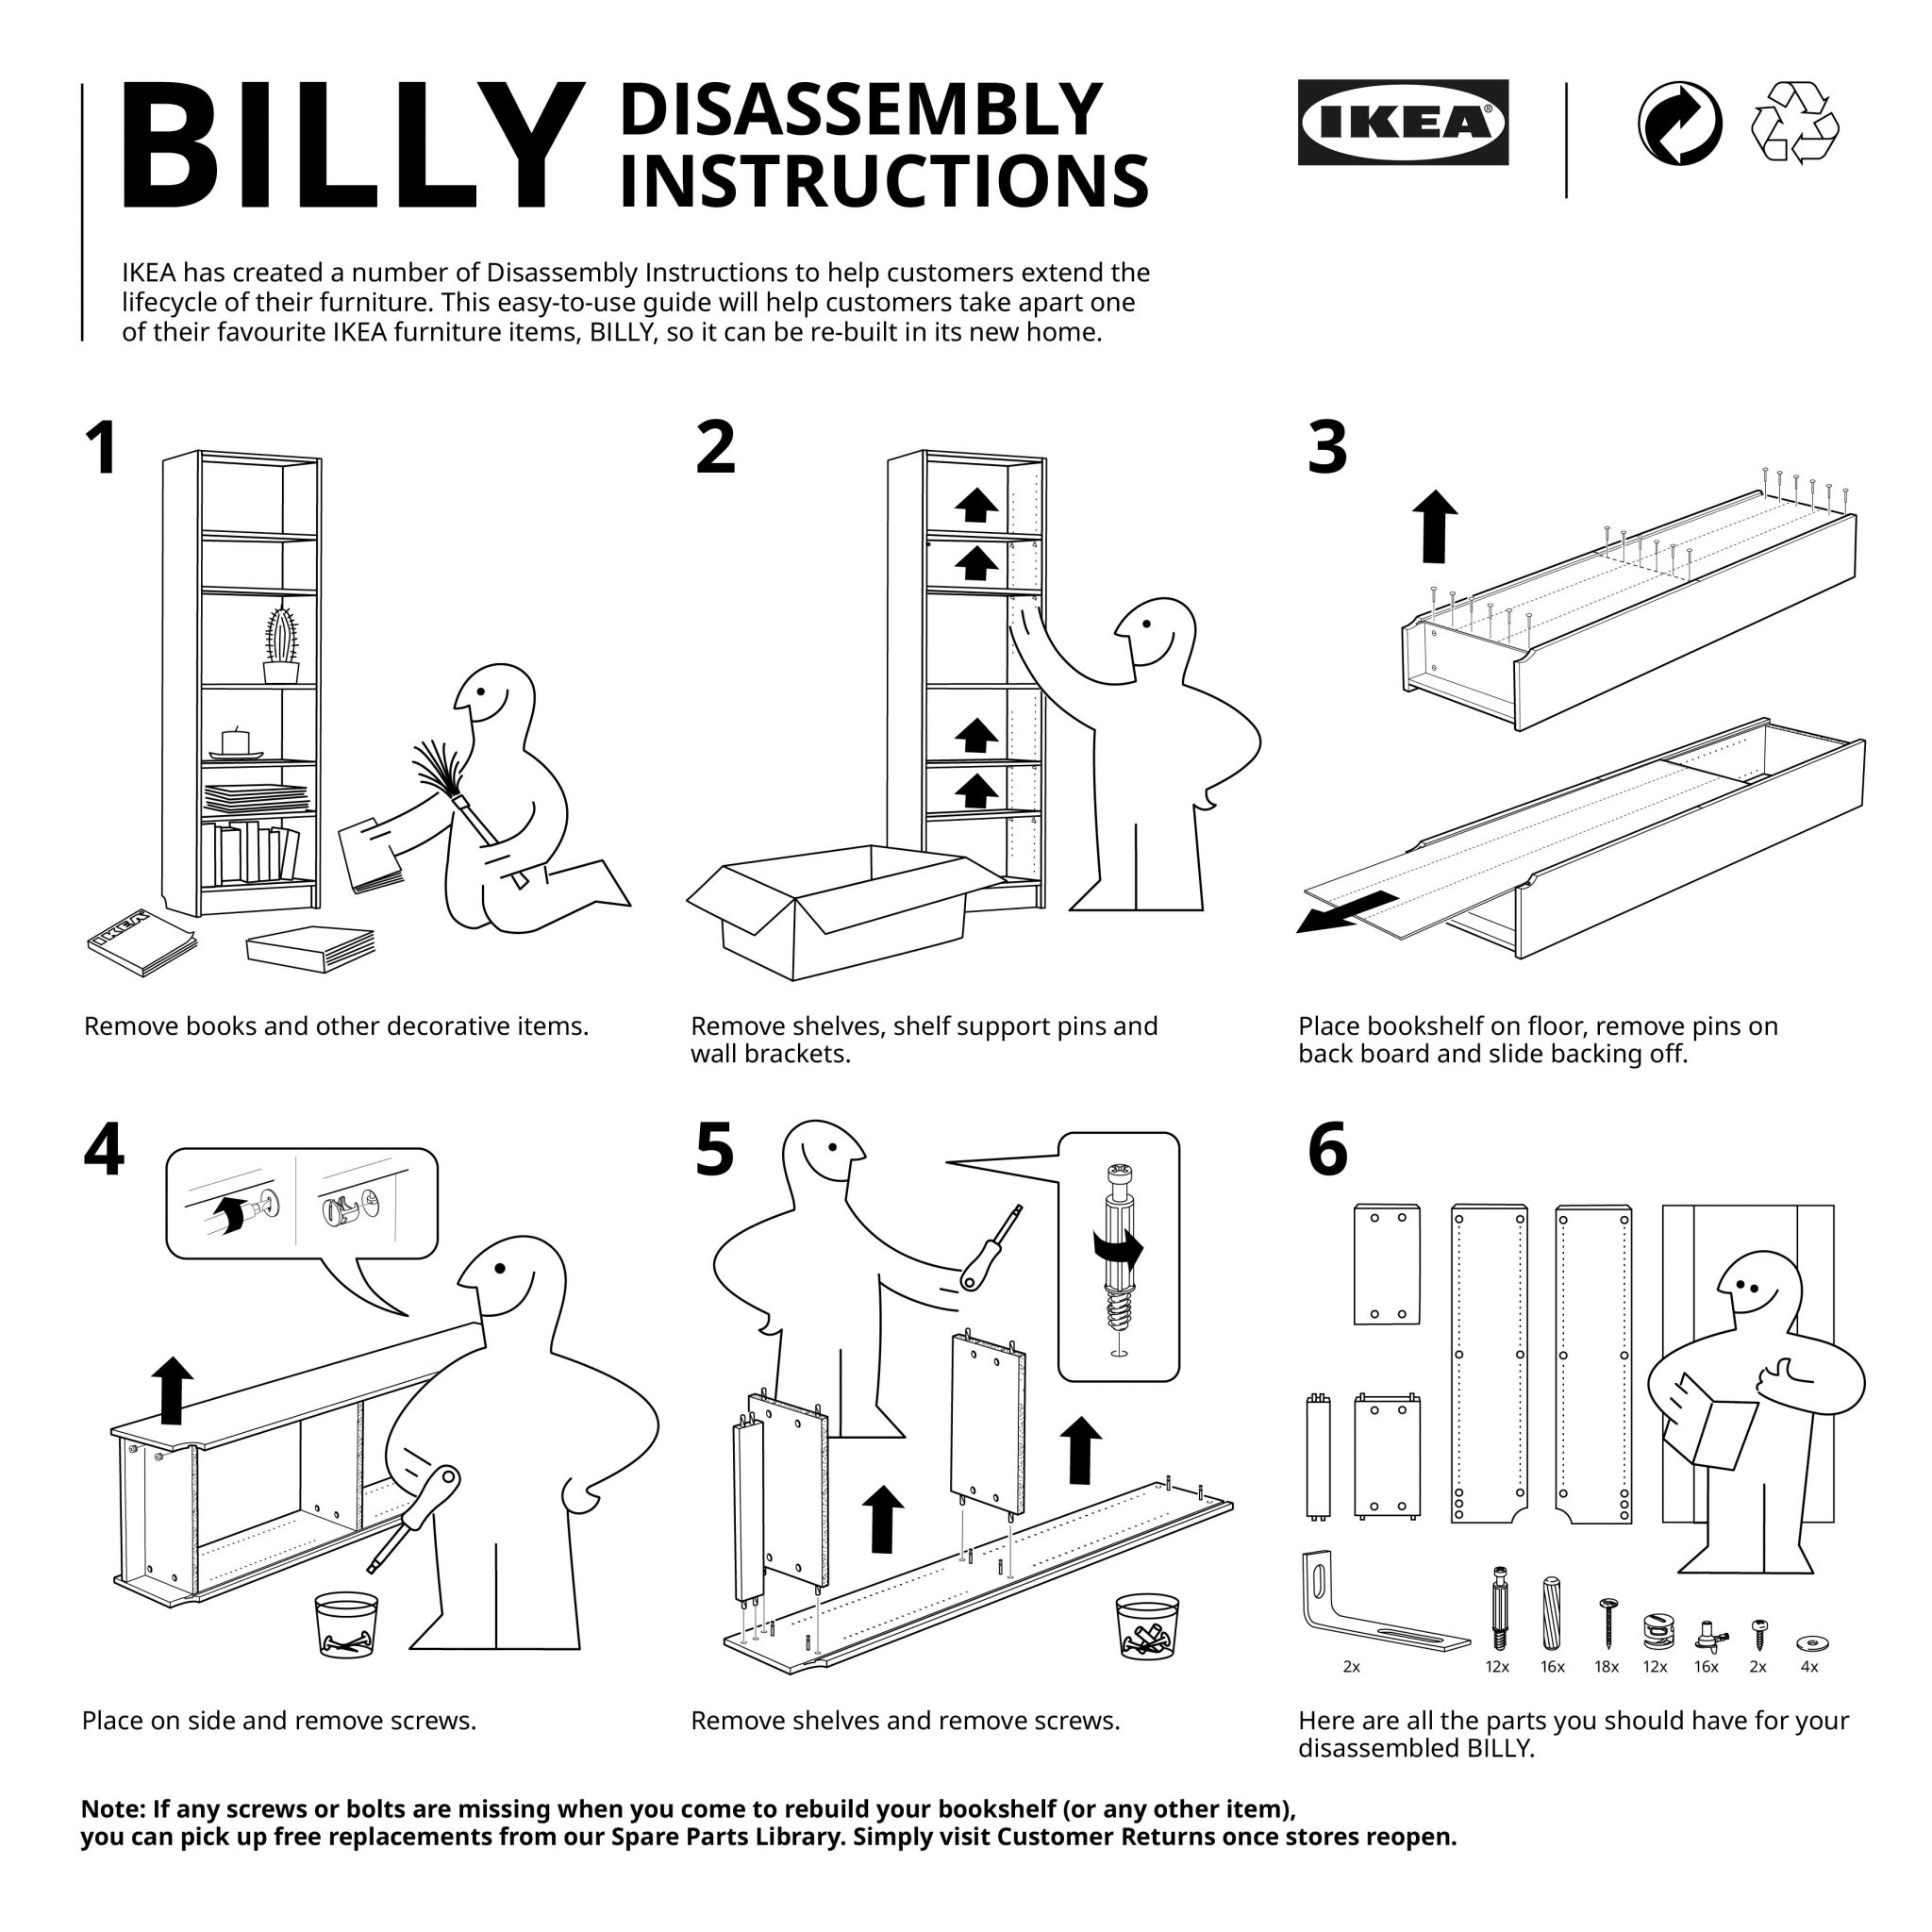 IKEA Disassembly Instructions